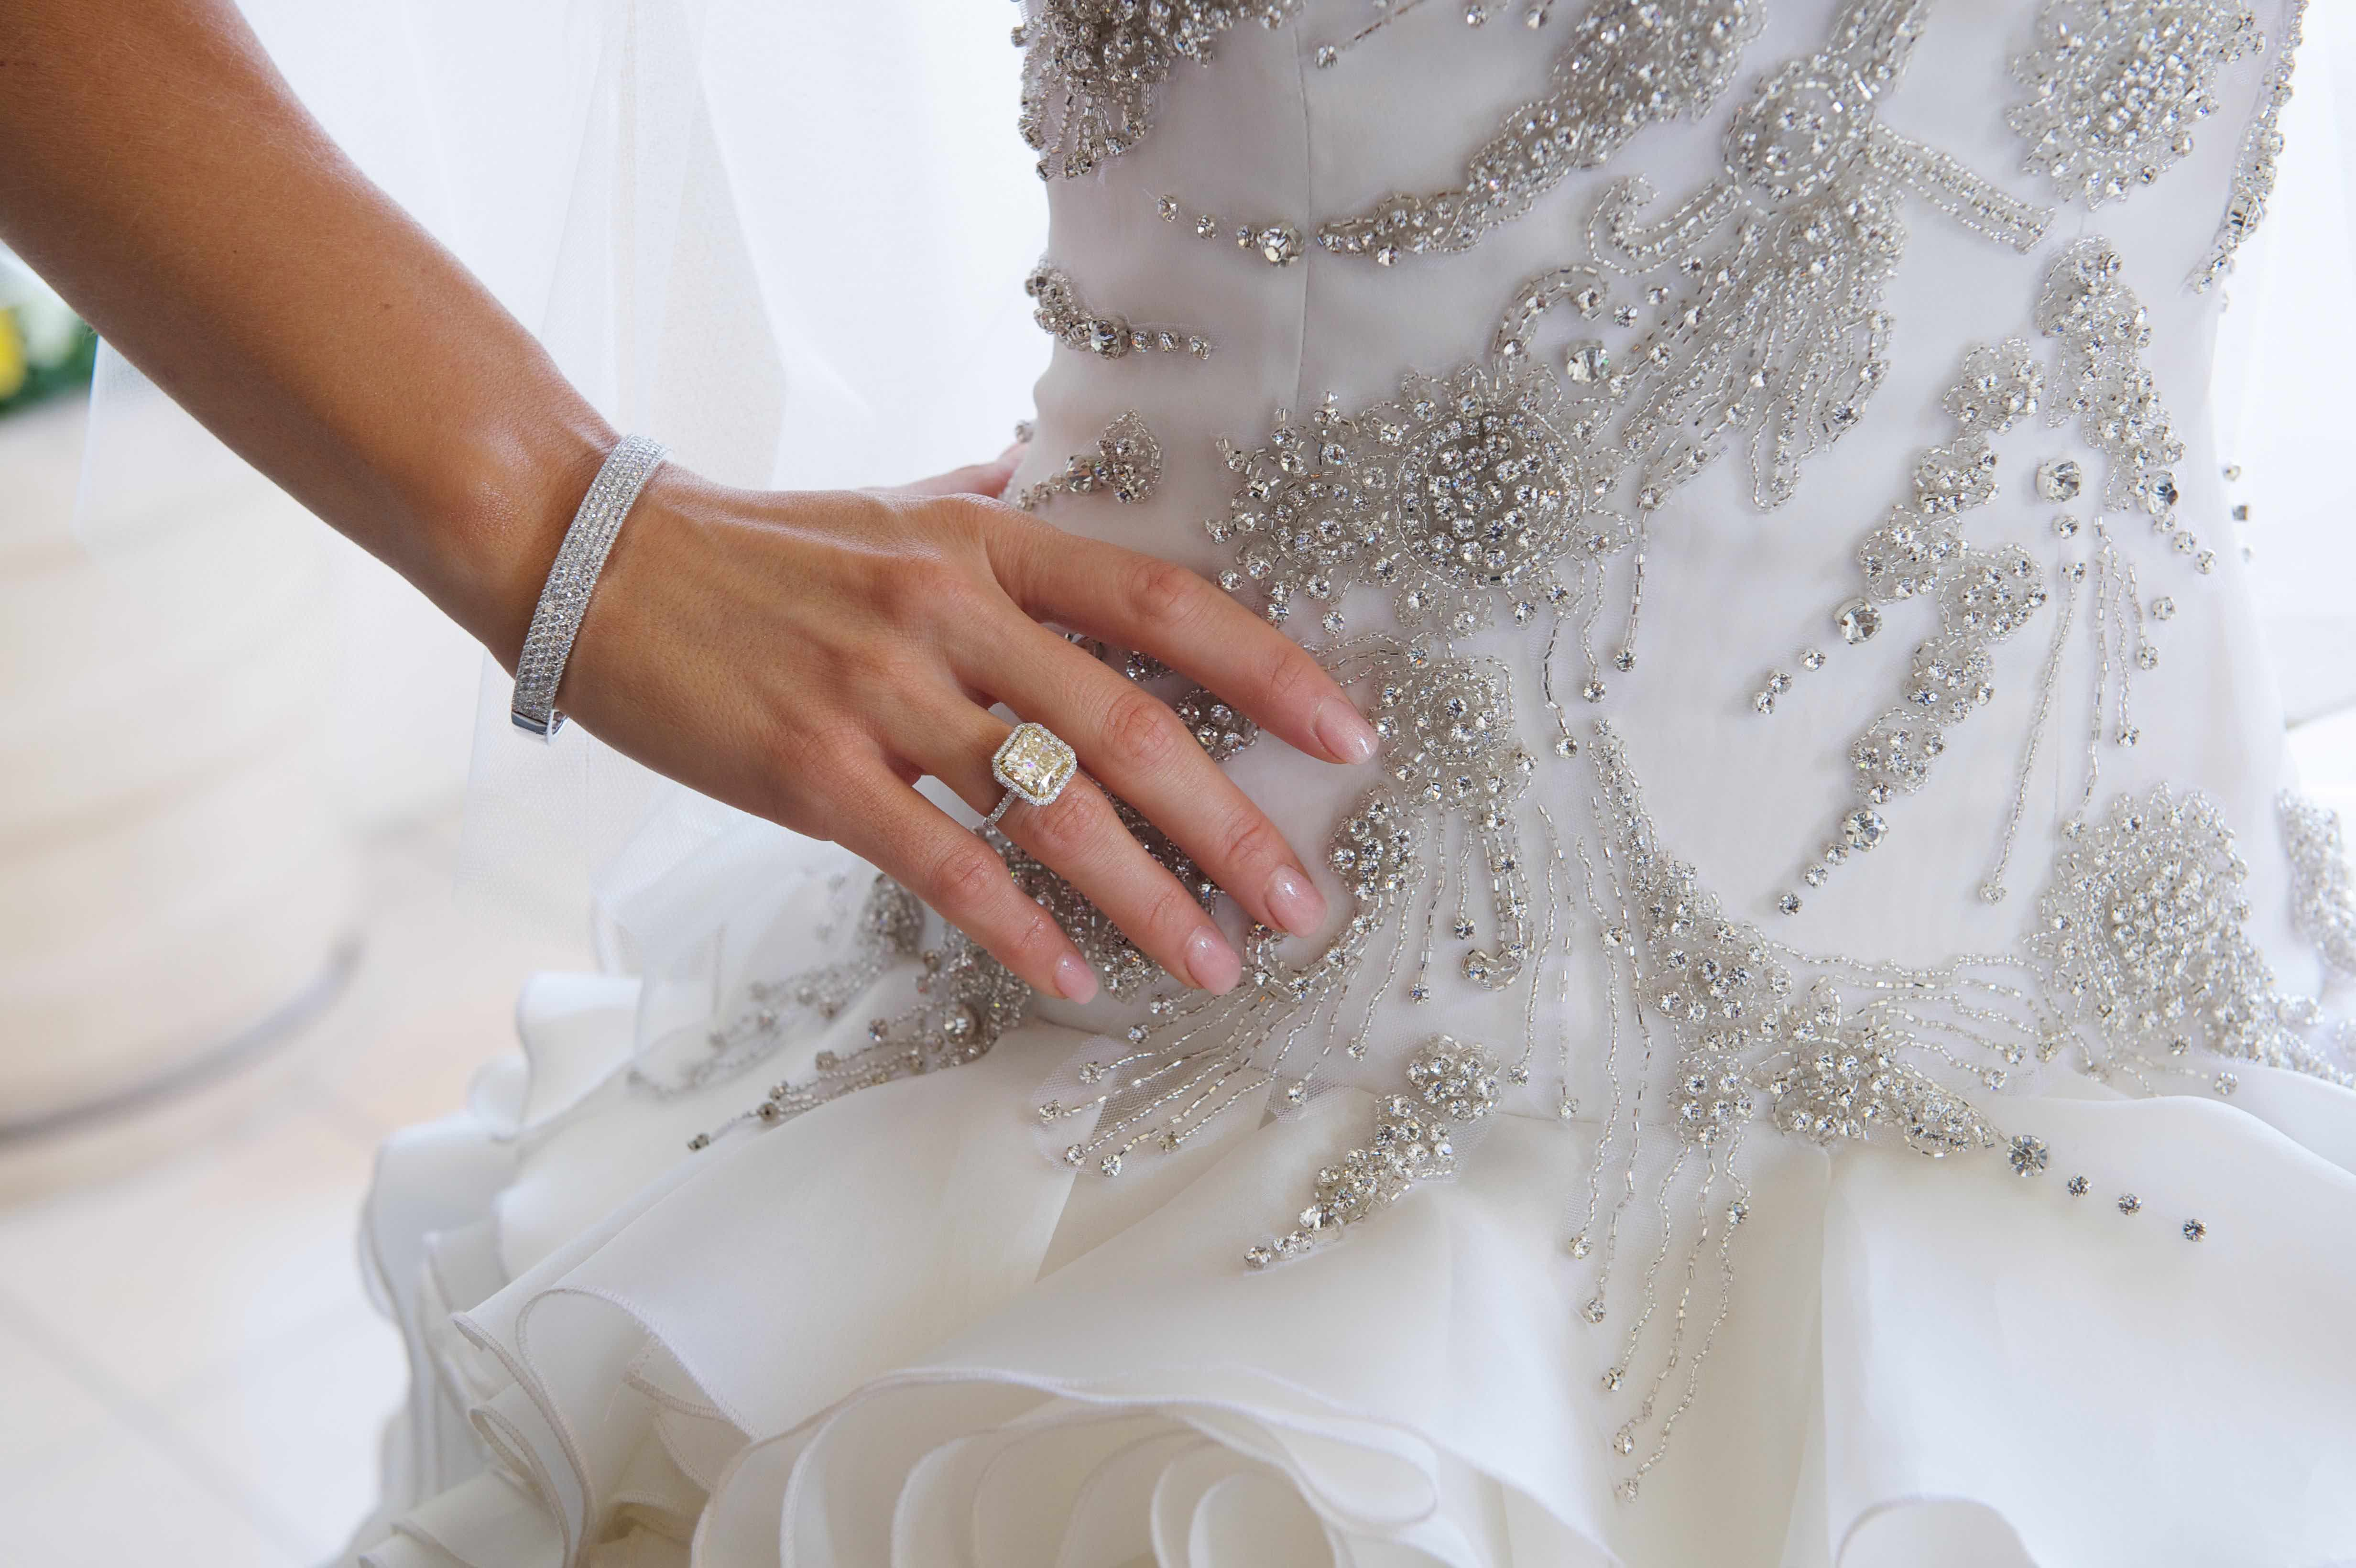 Joanna Krupa Engagement Ring and Bracelet